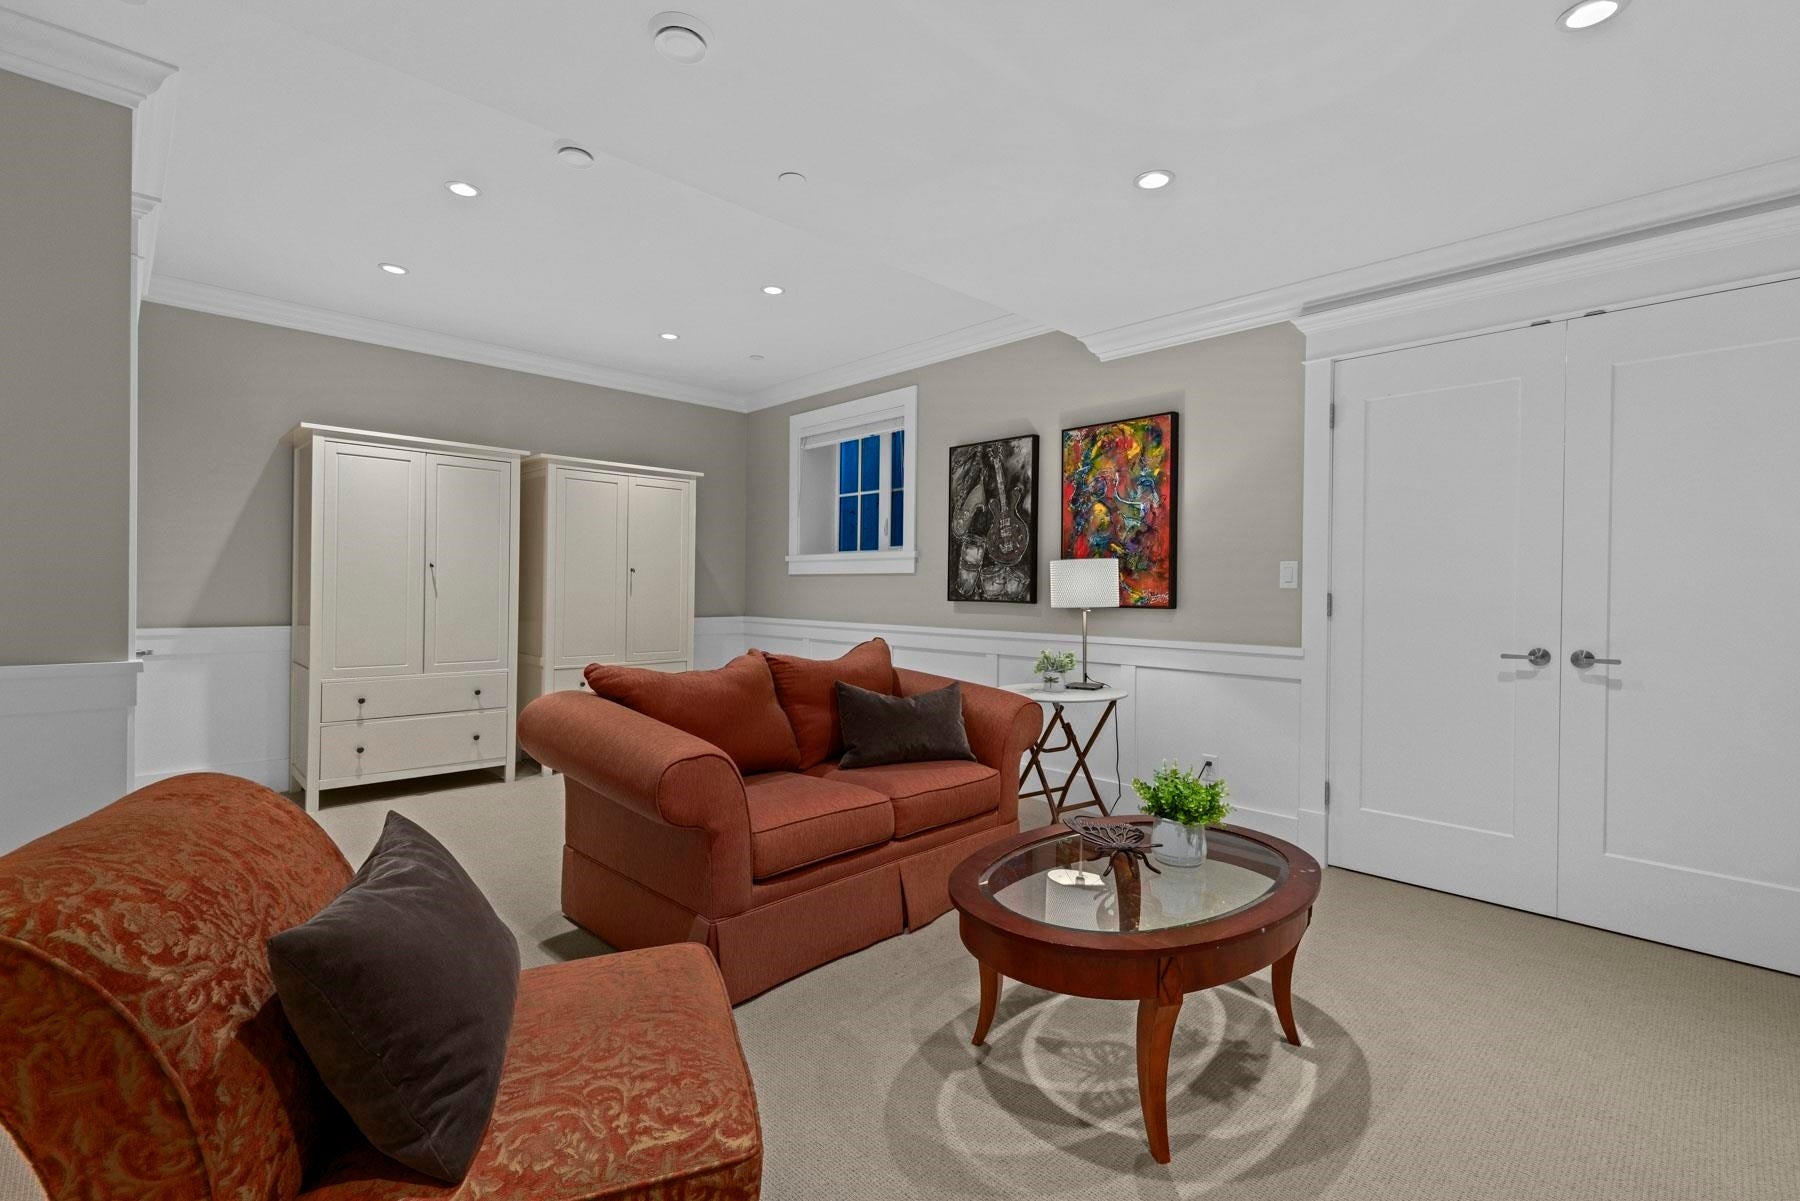 1421 GORDON AVENUE - Ambleside House/Single Family for sale, 3 Bedrooms (R2617756) - #16